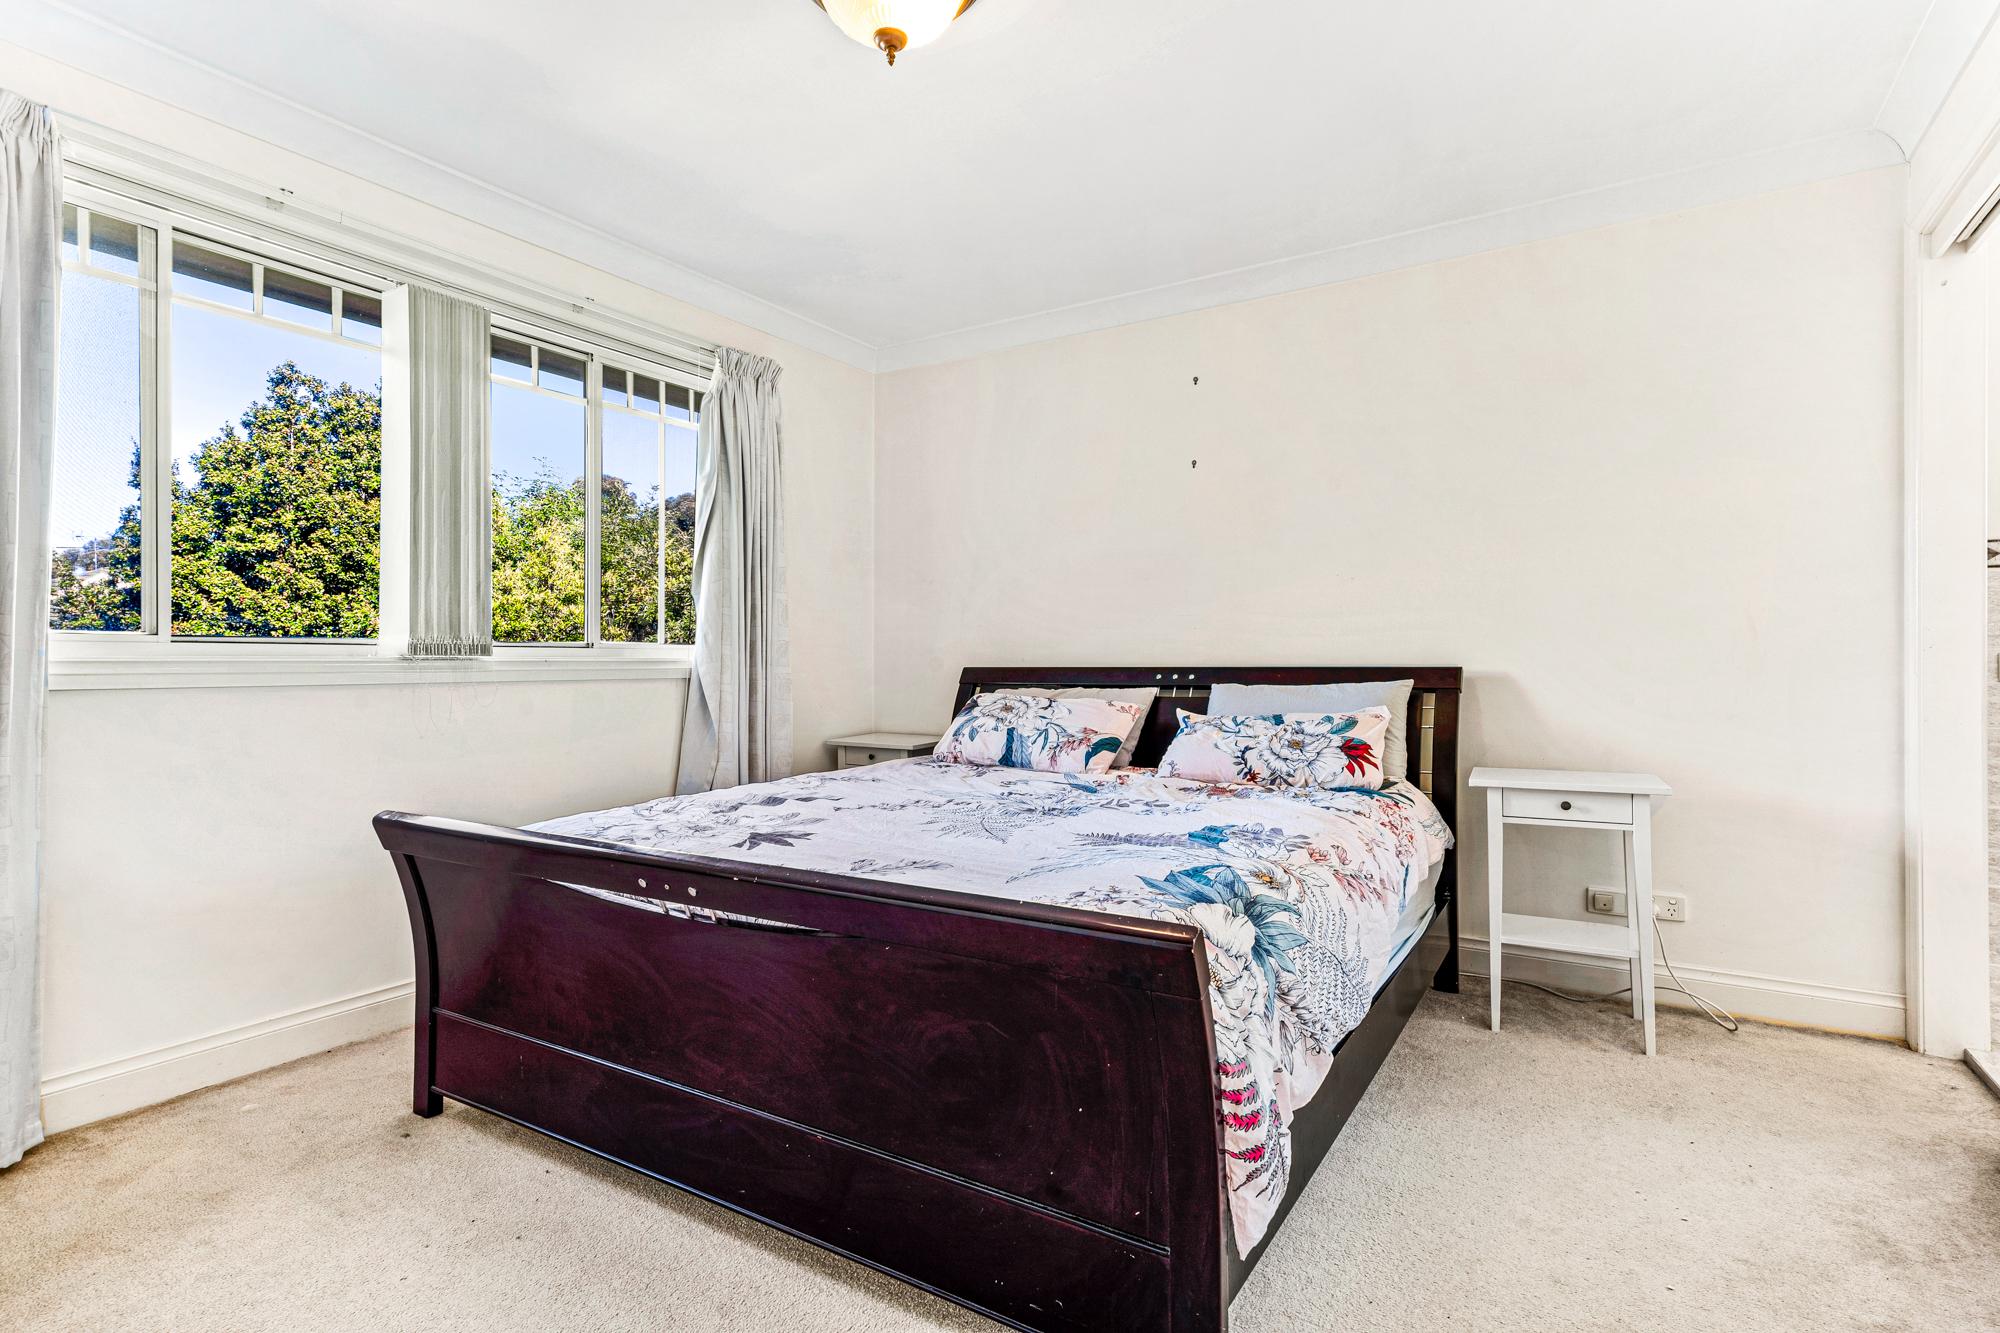 18 John Radley Ave, Dural NSW 2158